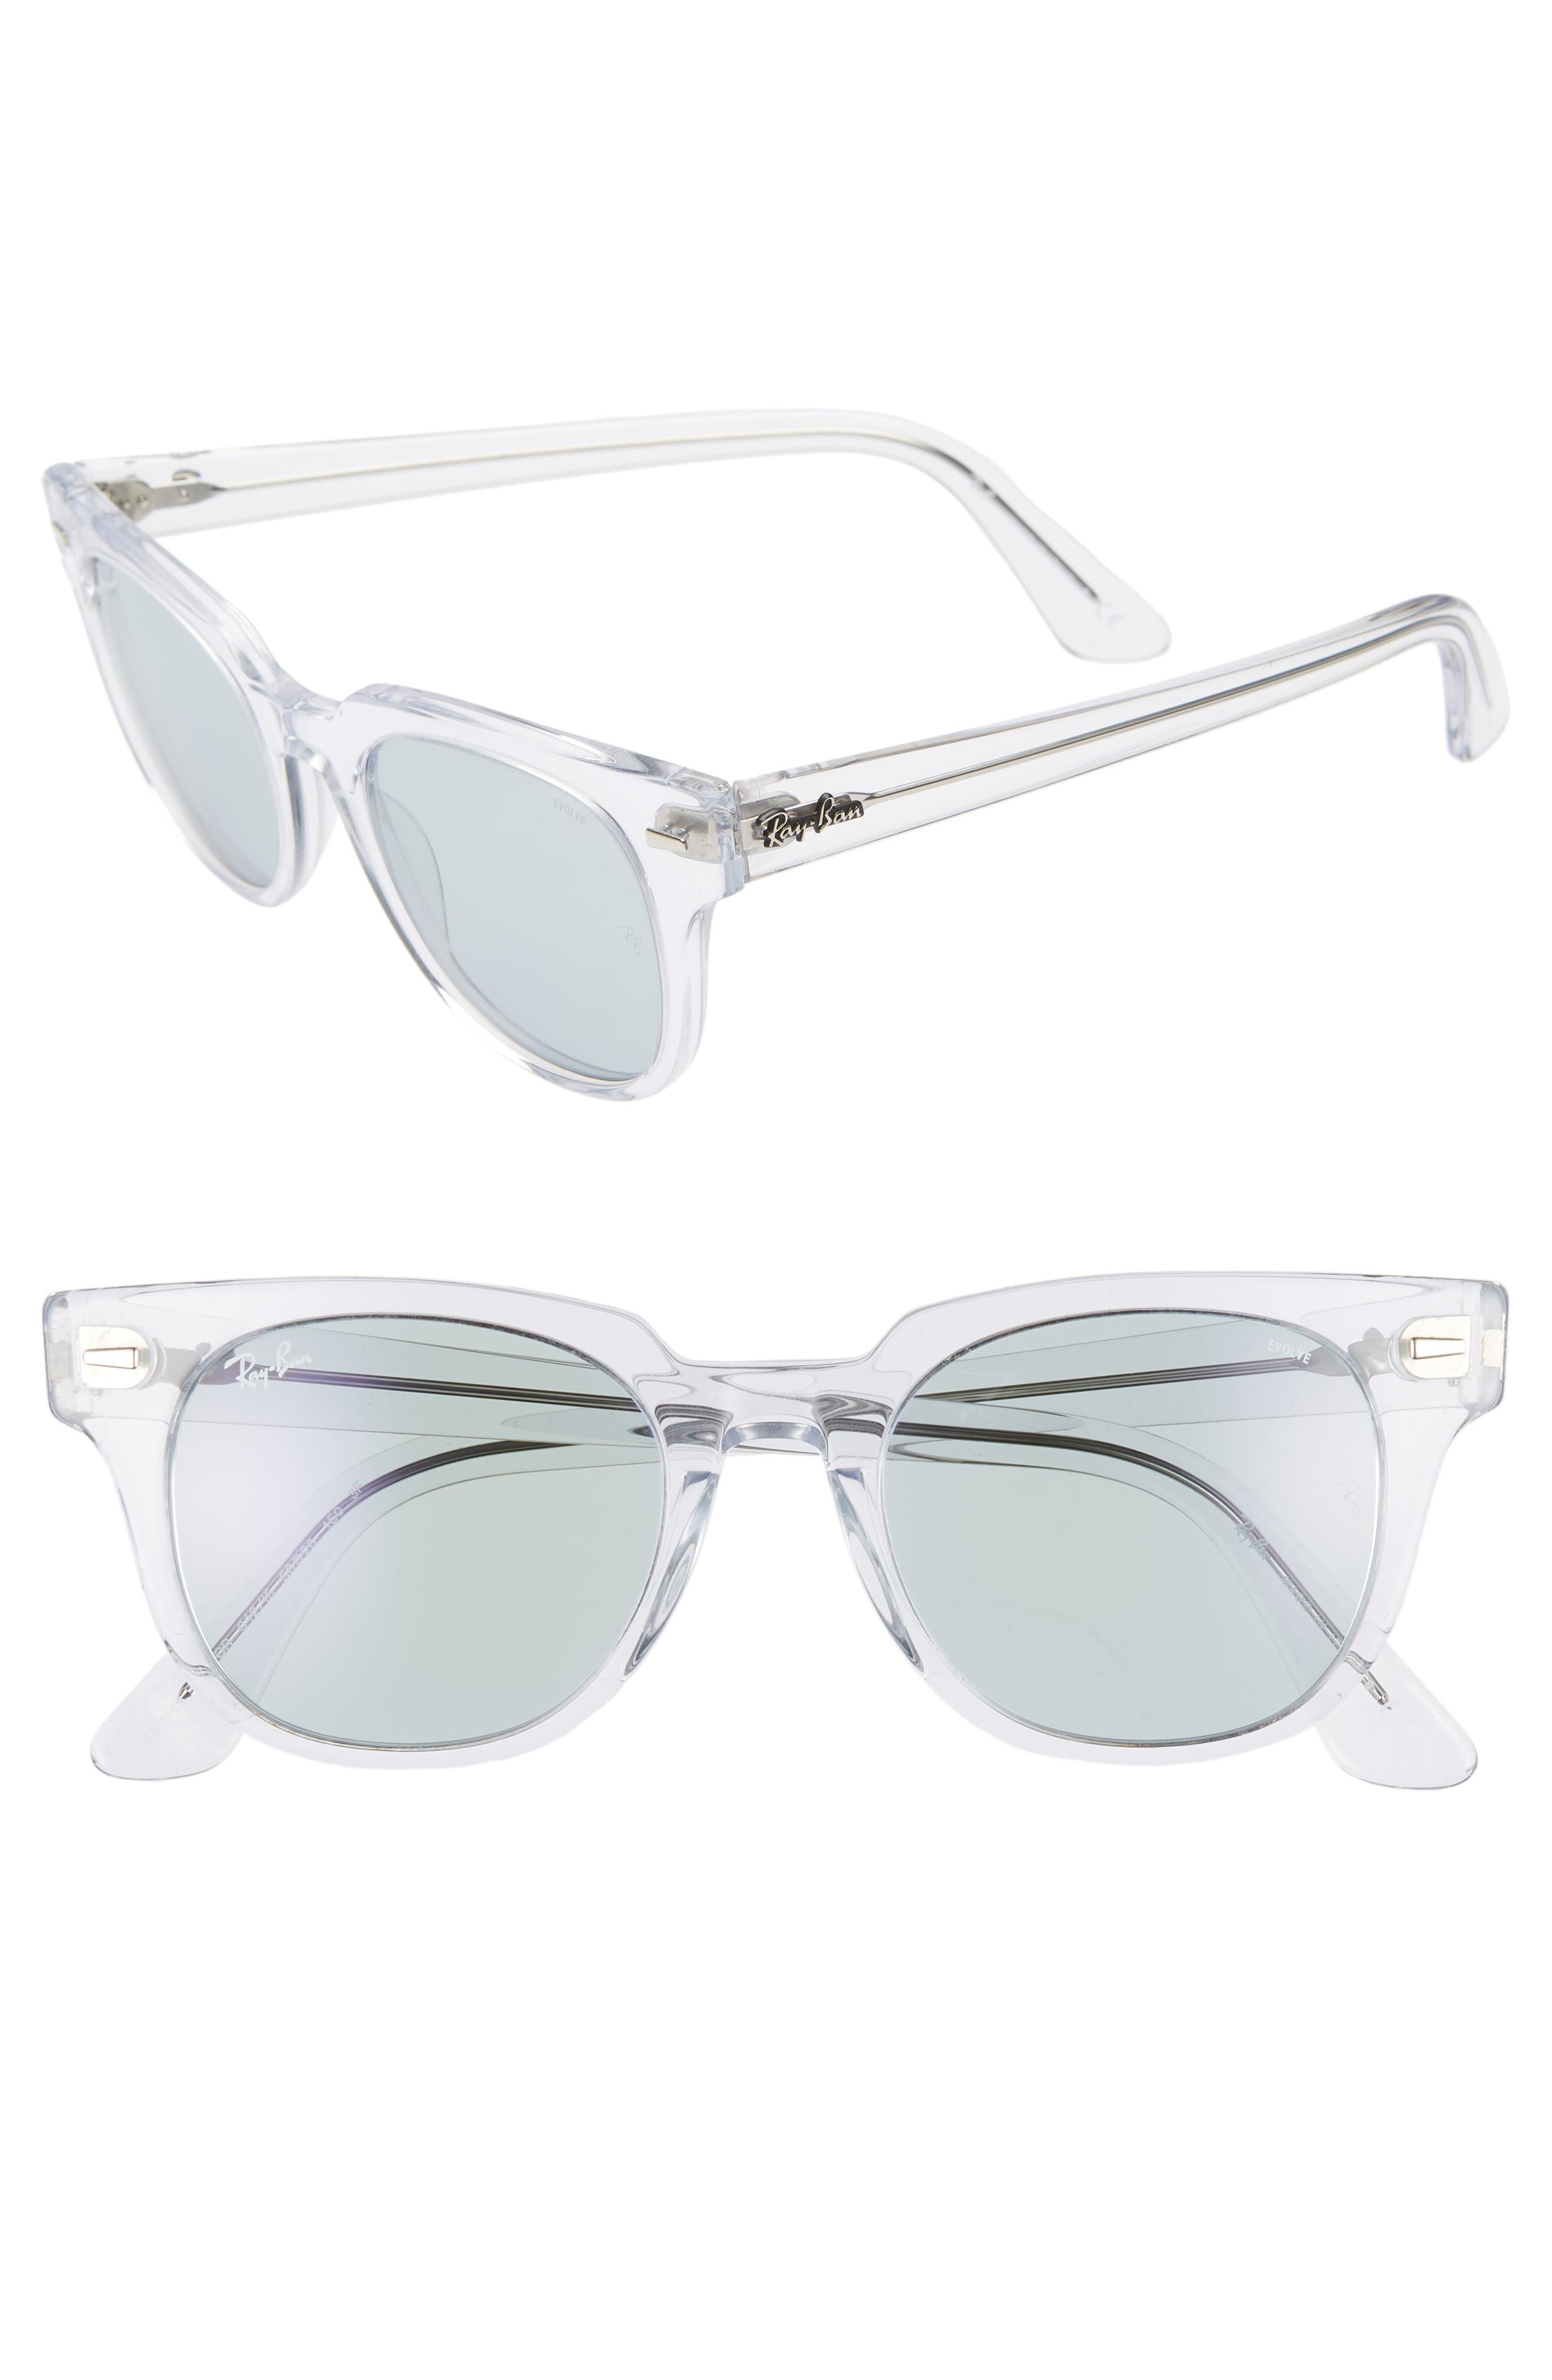 RAY-BAN, Meteor 50mm Wayfarer Photochromic Sunglasses, Main thumbnail 1, color, CRYSTAL/ BLUE SOLID